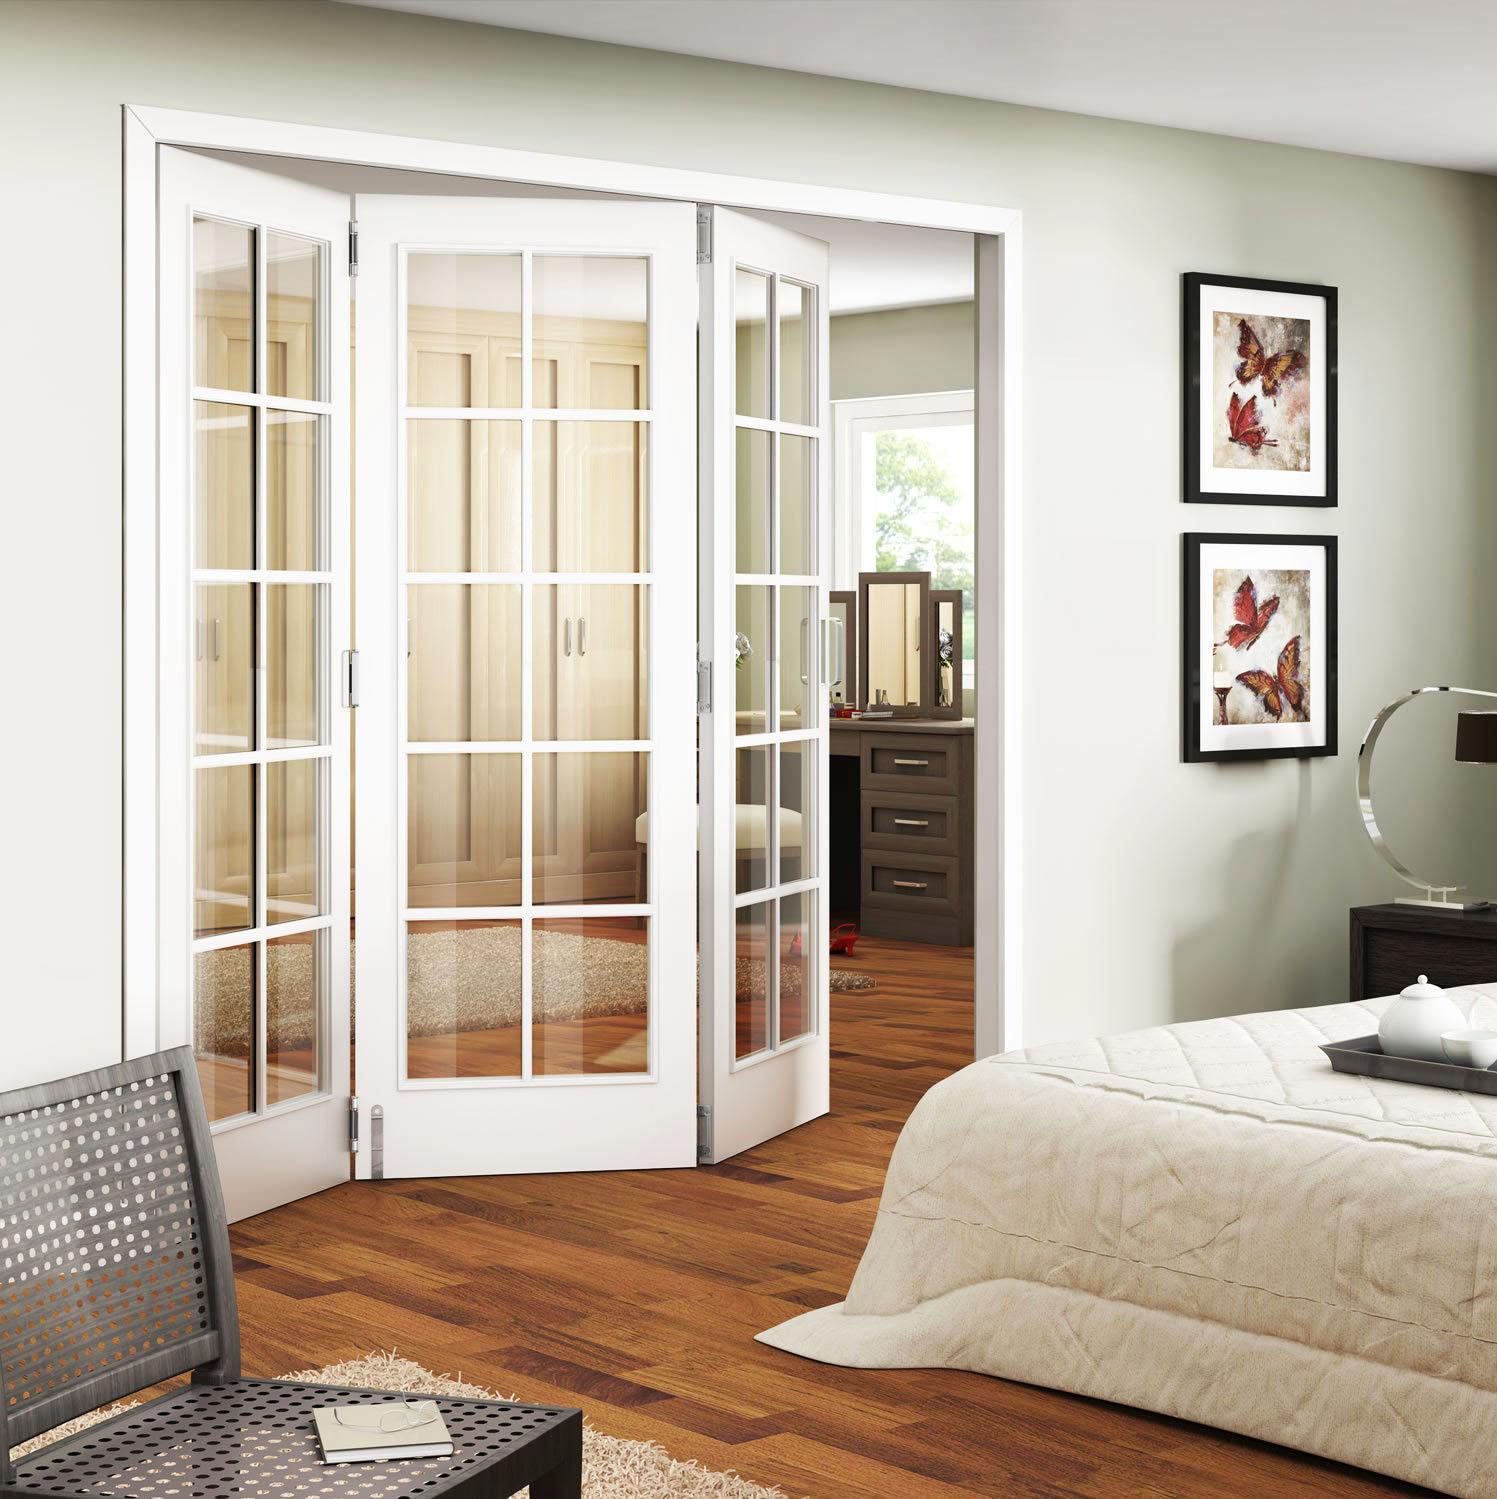 french doors interior bedroom photo - 3